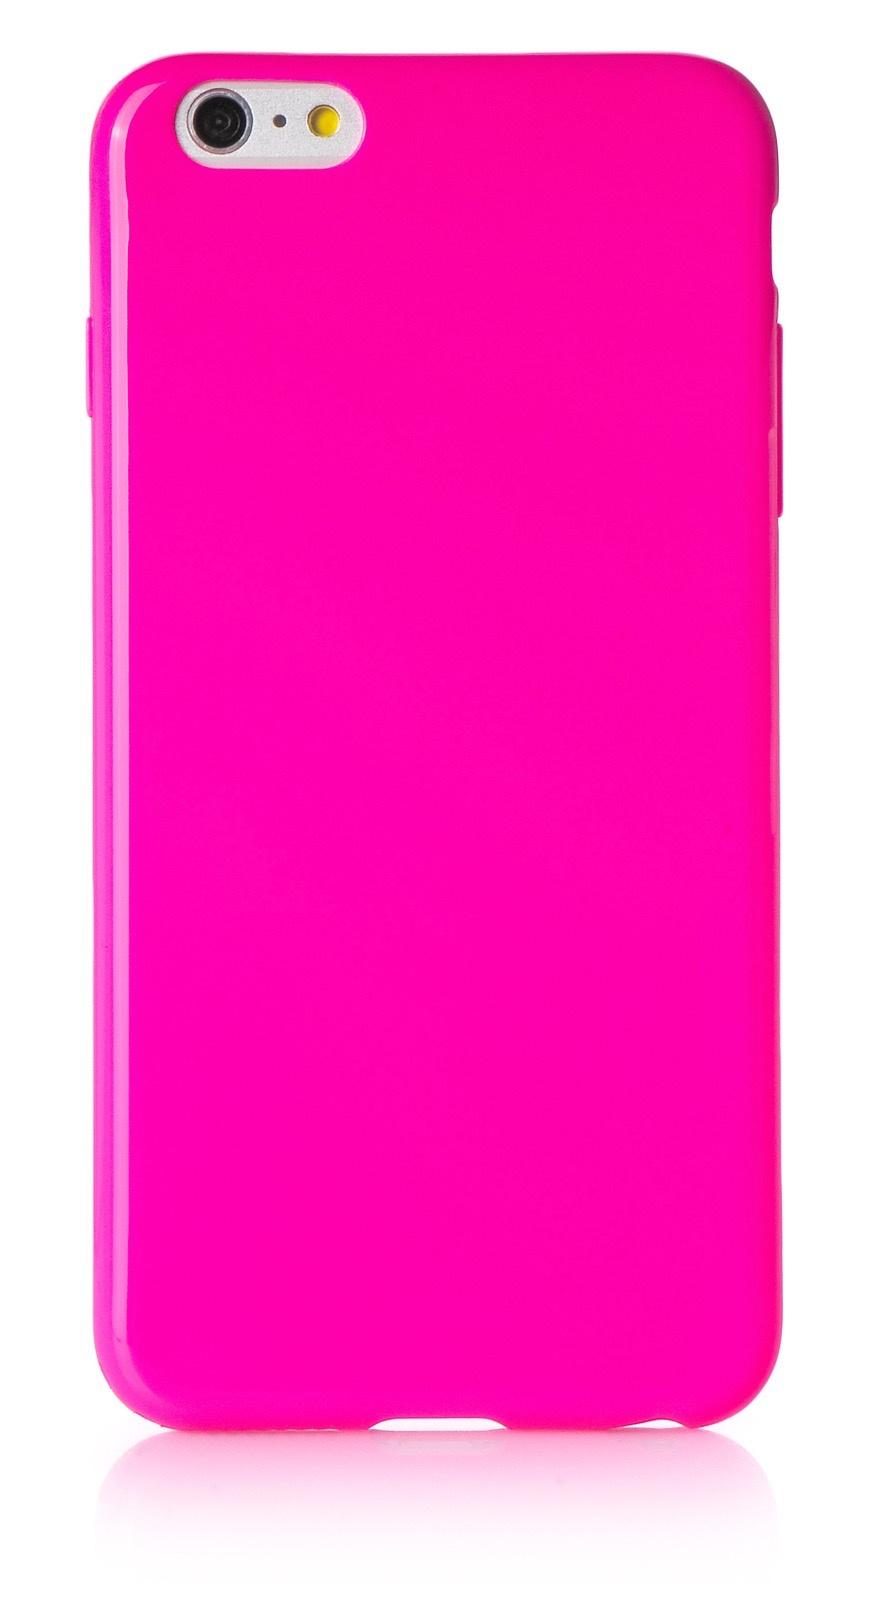 "Чехол для сотового телефона iNeez накладка силикон мыльница 620115 для Apple Iphone 6 Plus/6S Plus 5.5"", темно-розовый"